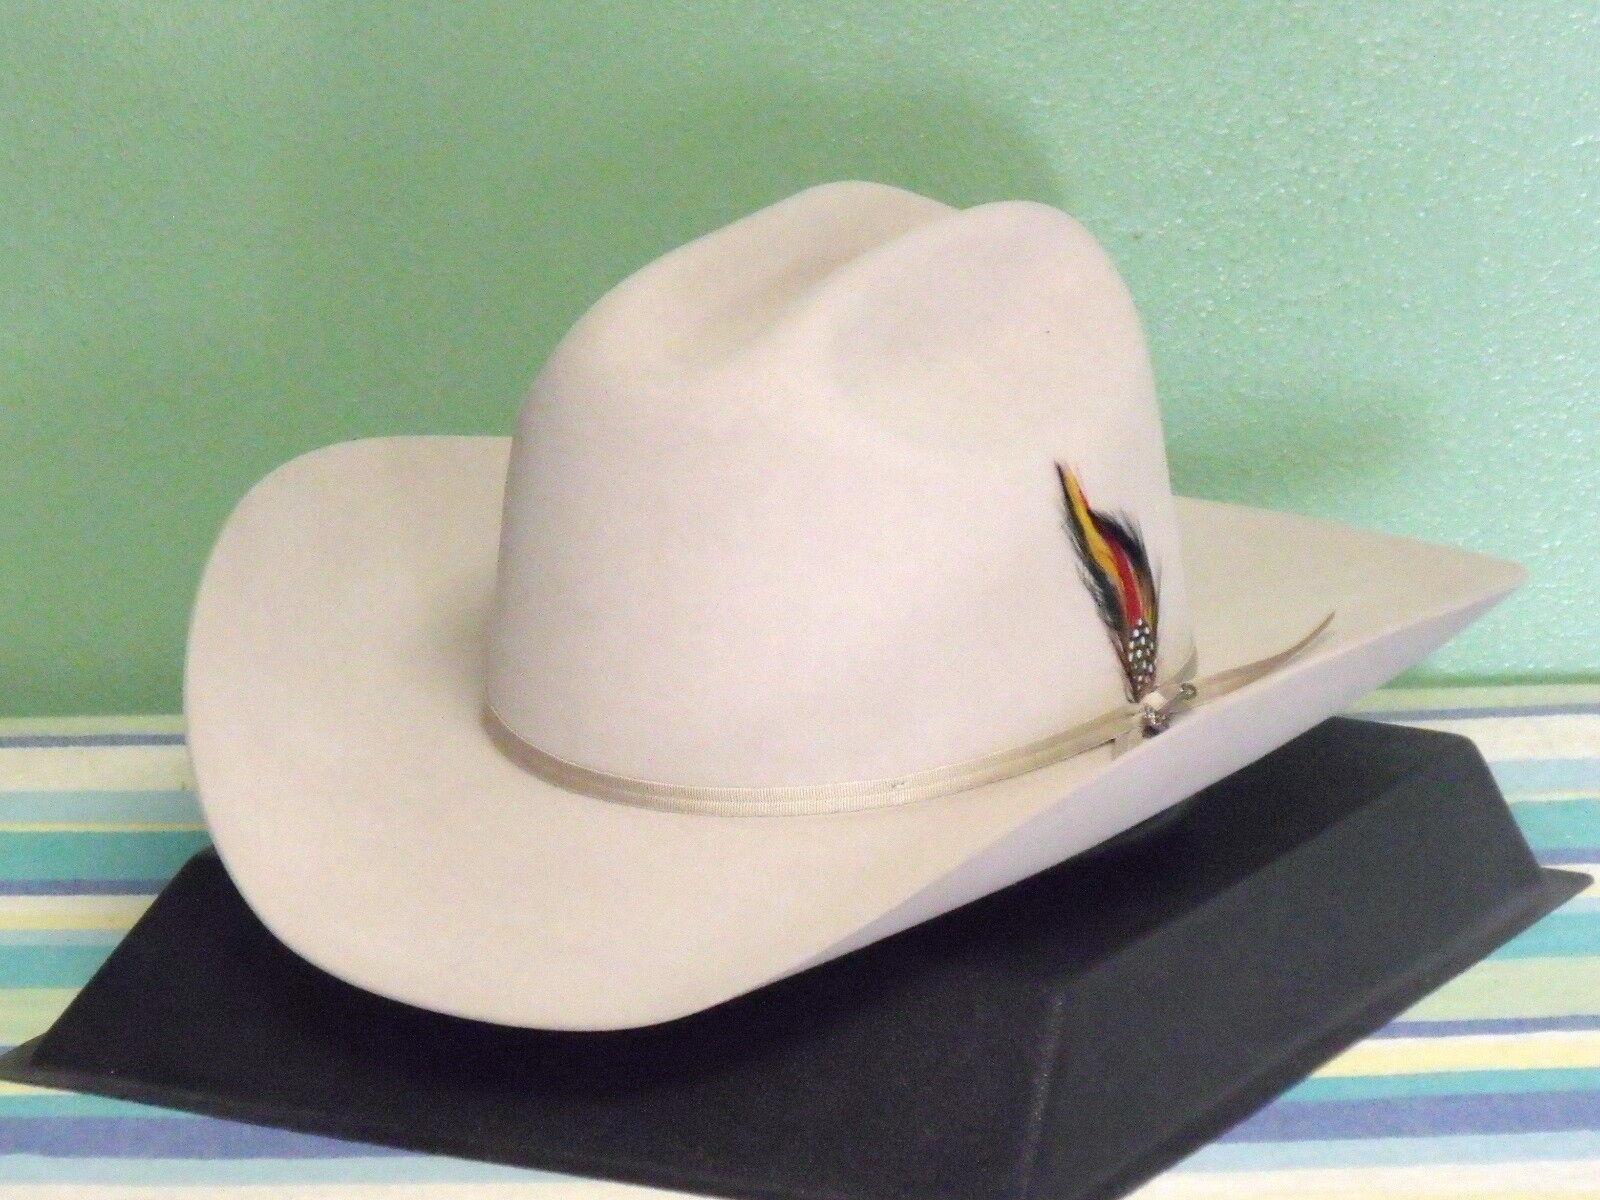 Stetson Roper 4x Beaver Fur Felt Hat Black Size 7 1 2 (60) Made in USA EUC  for sale online  cc15b014b8cd